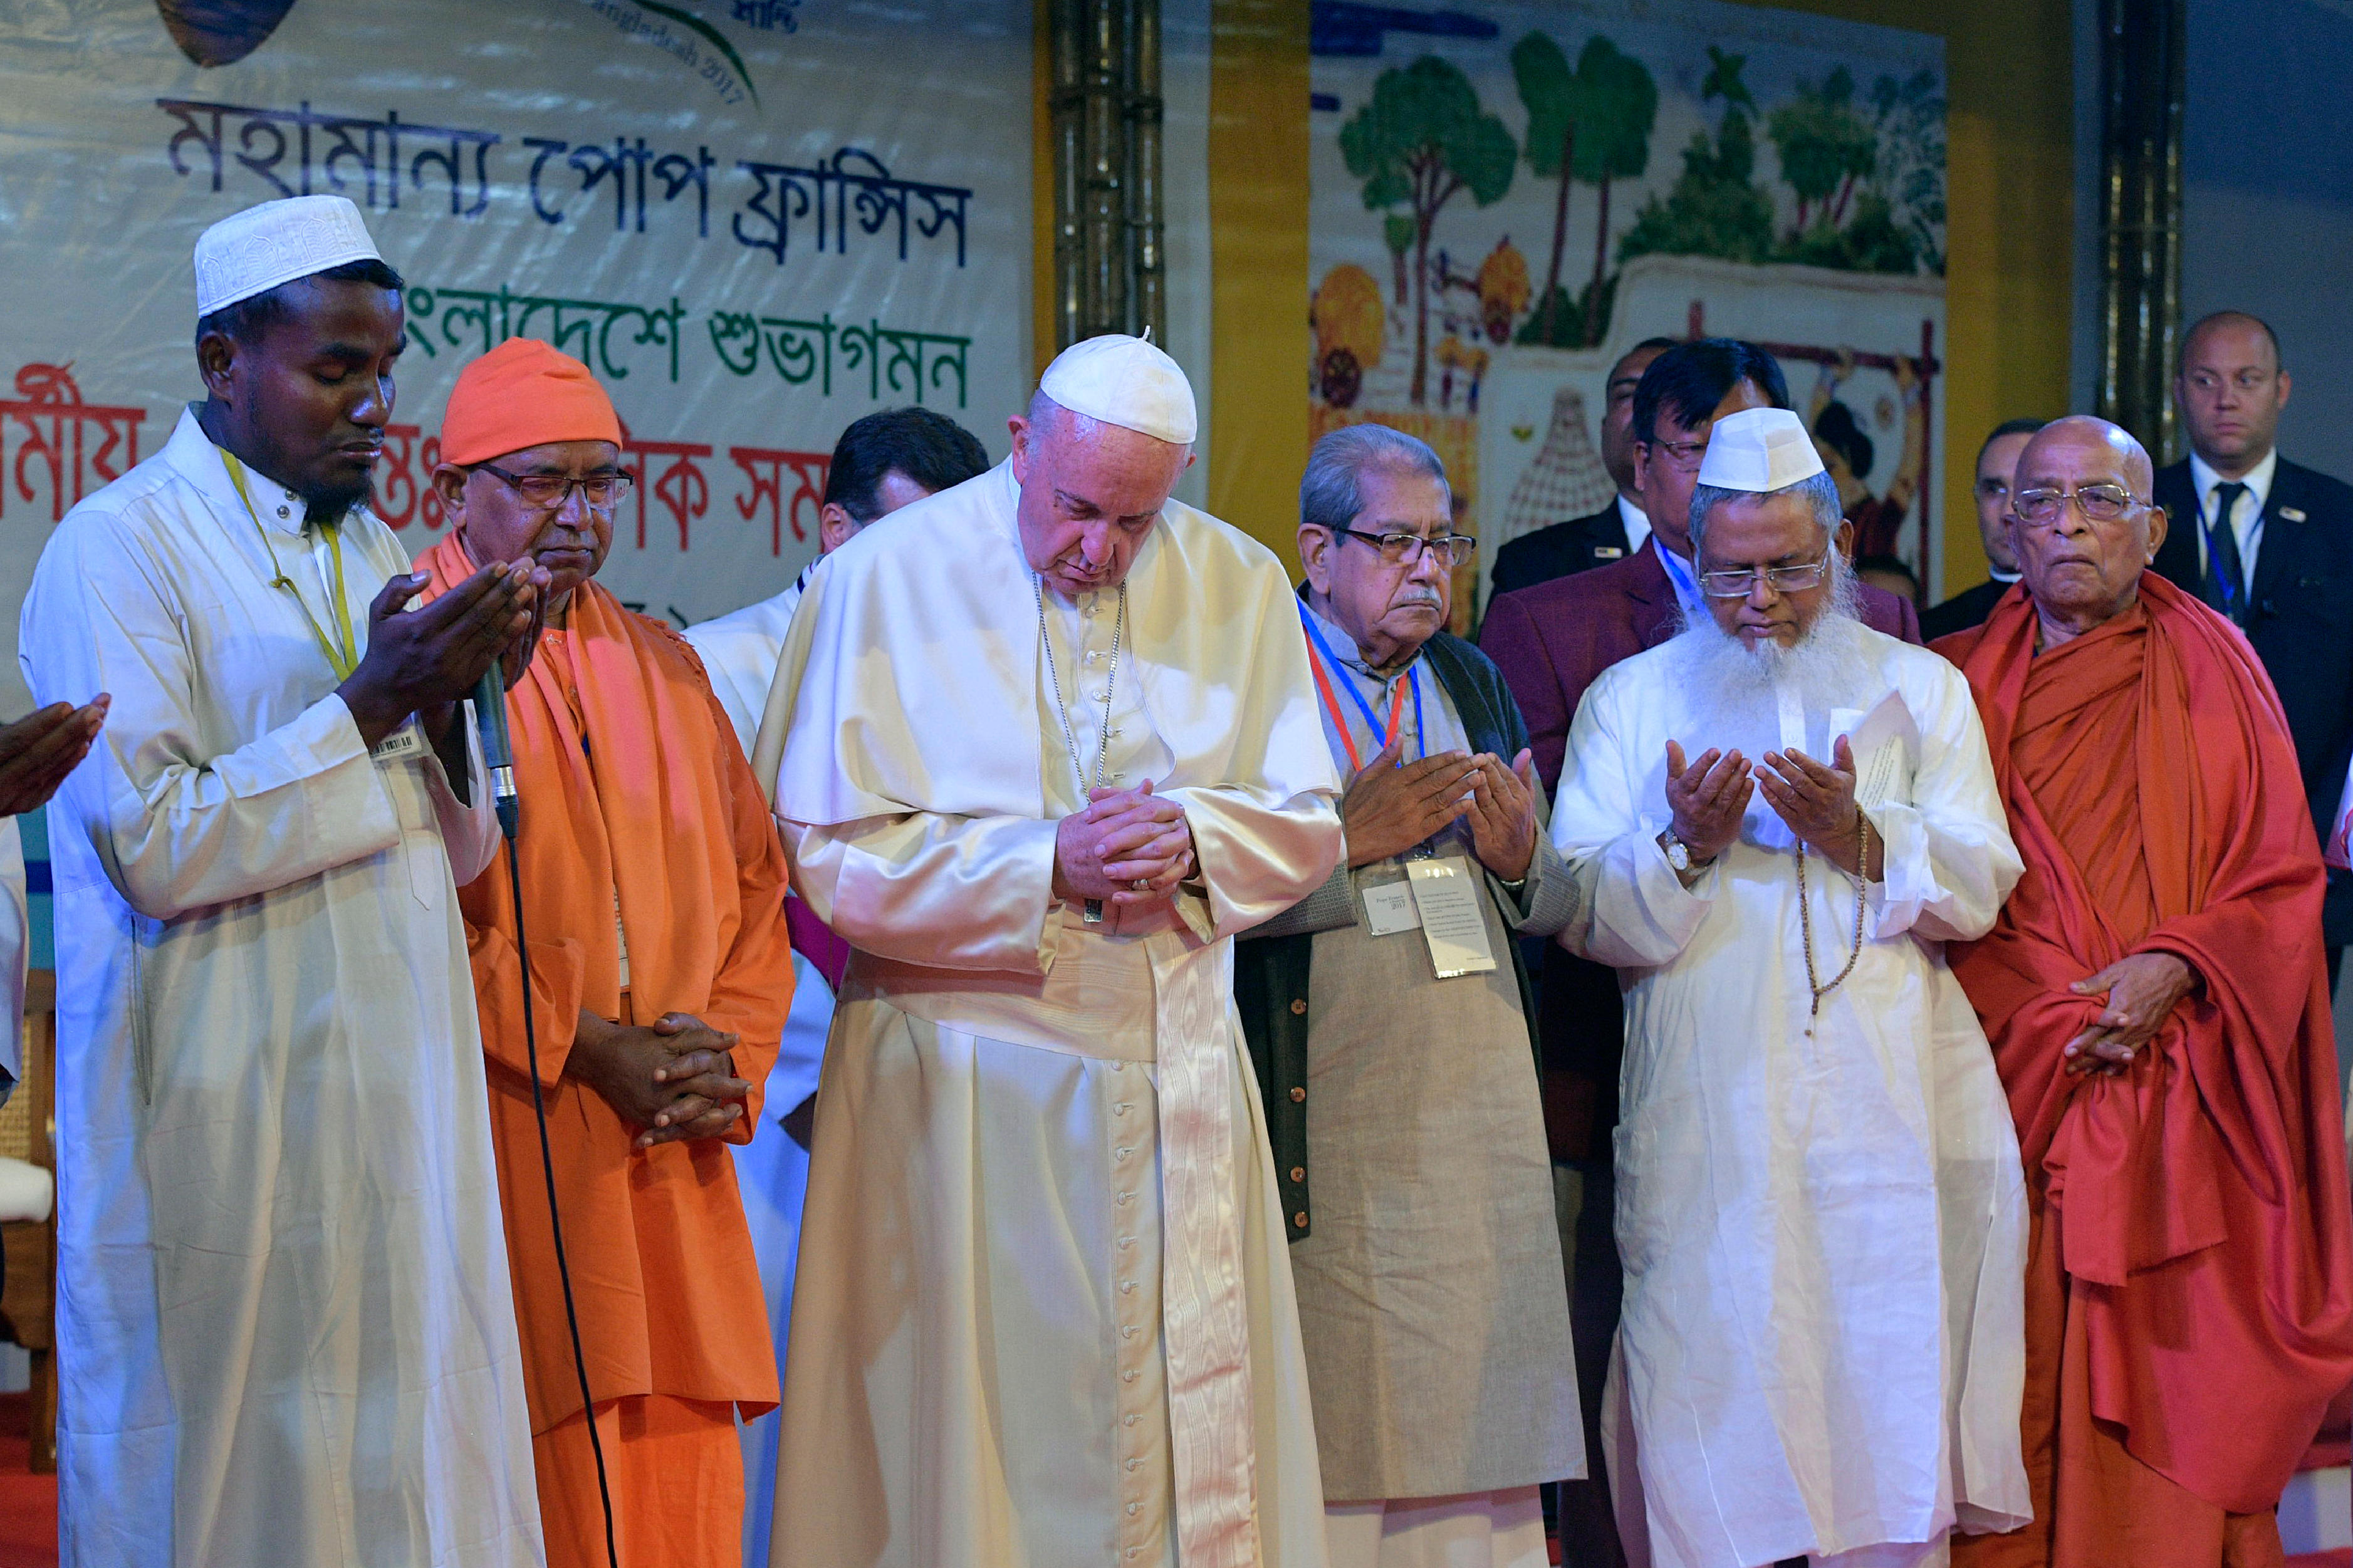 Prière interreligieuse pour la paix, Dacca, Bangladesh © L'Osservatore Romano